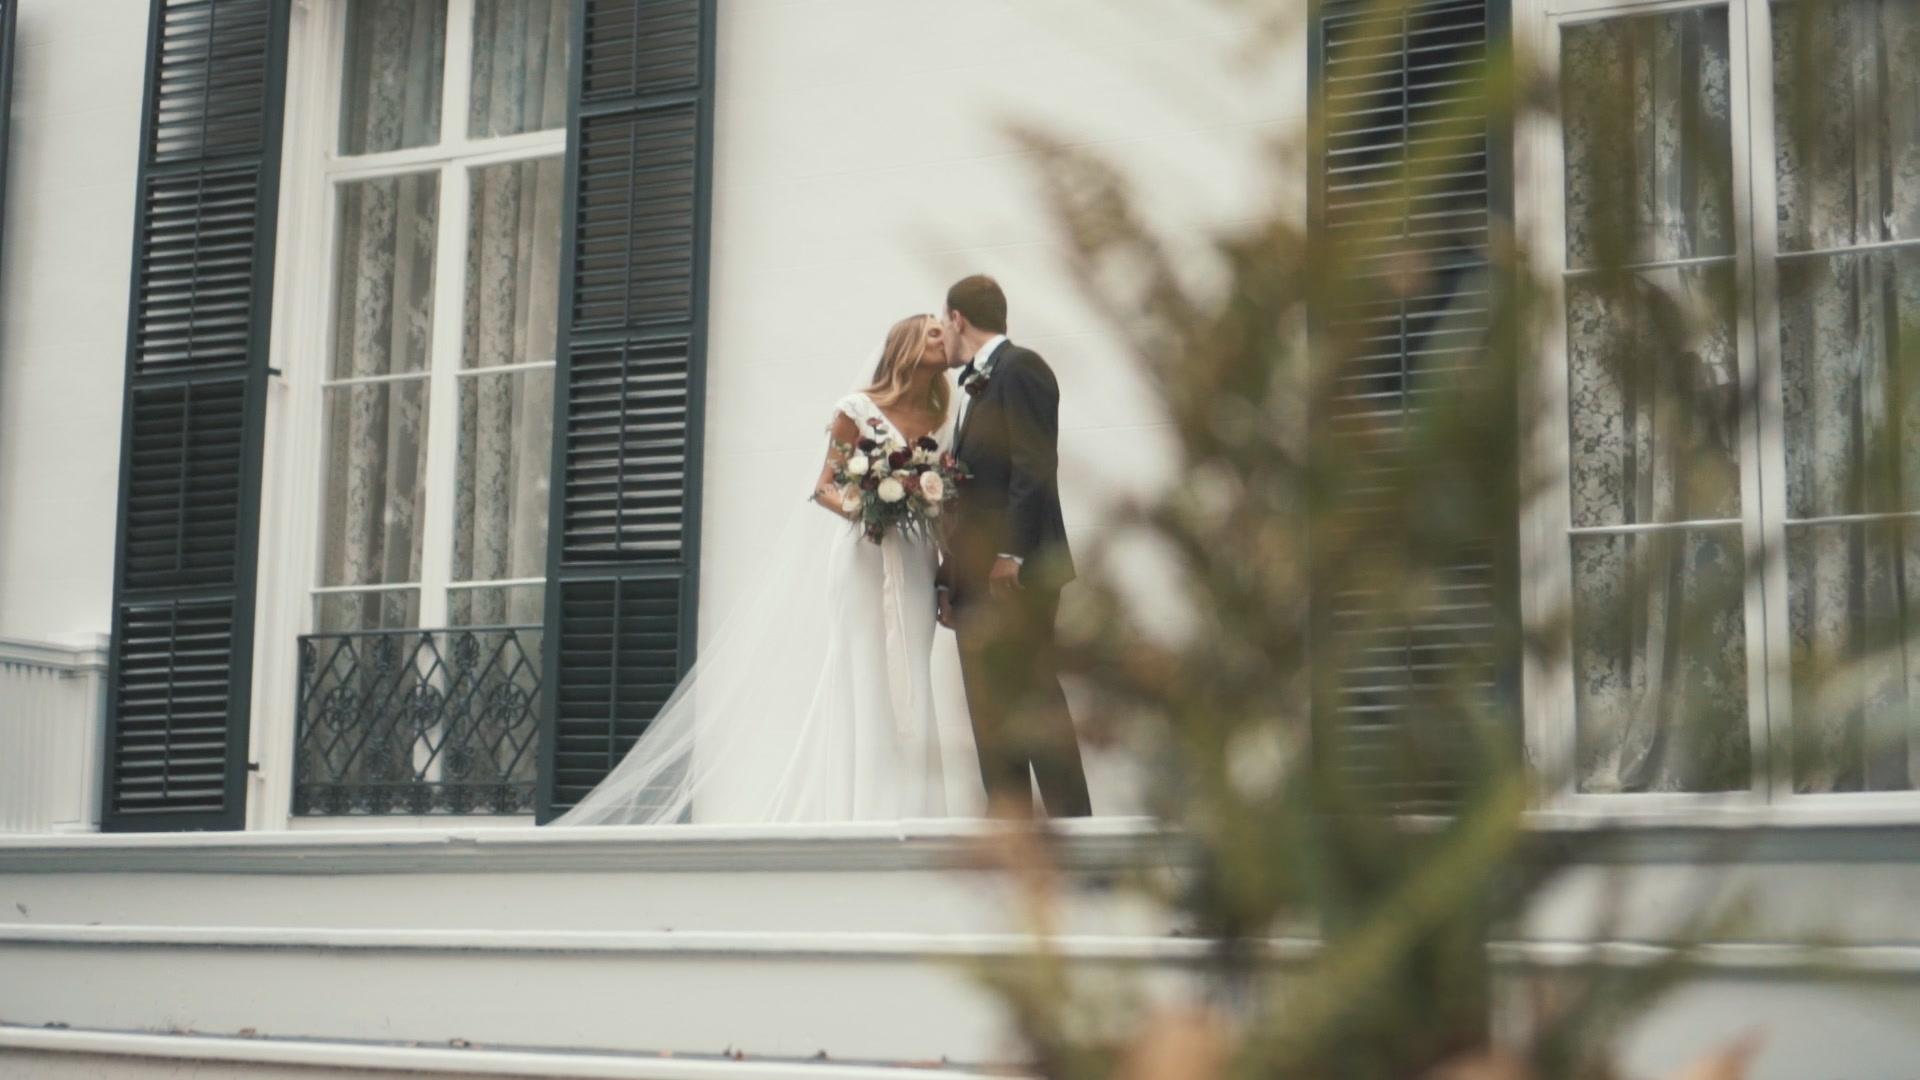 Andrew + Cora | Tallahassee, Florida | Goodwood Museum & Gardens